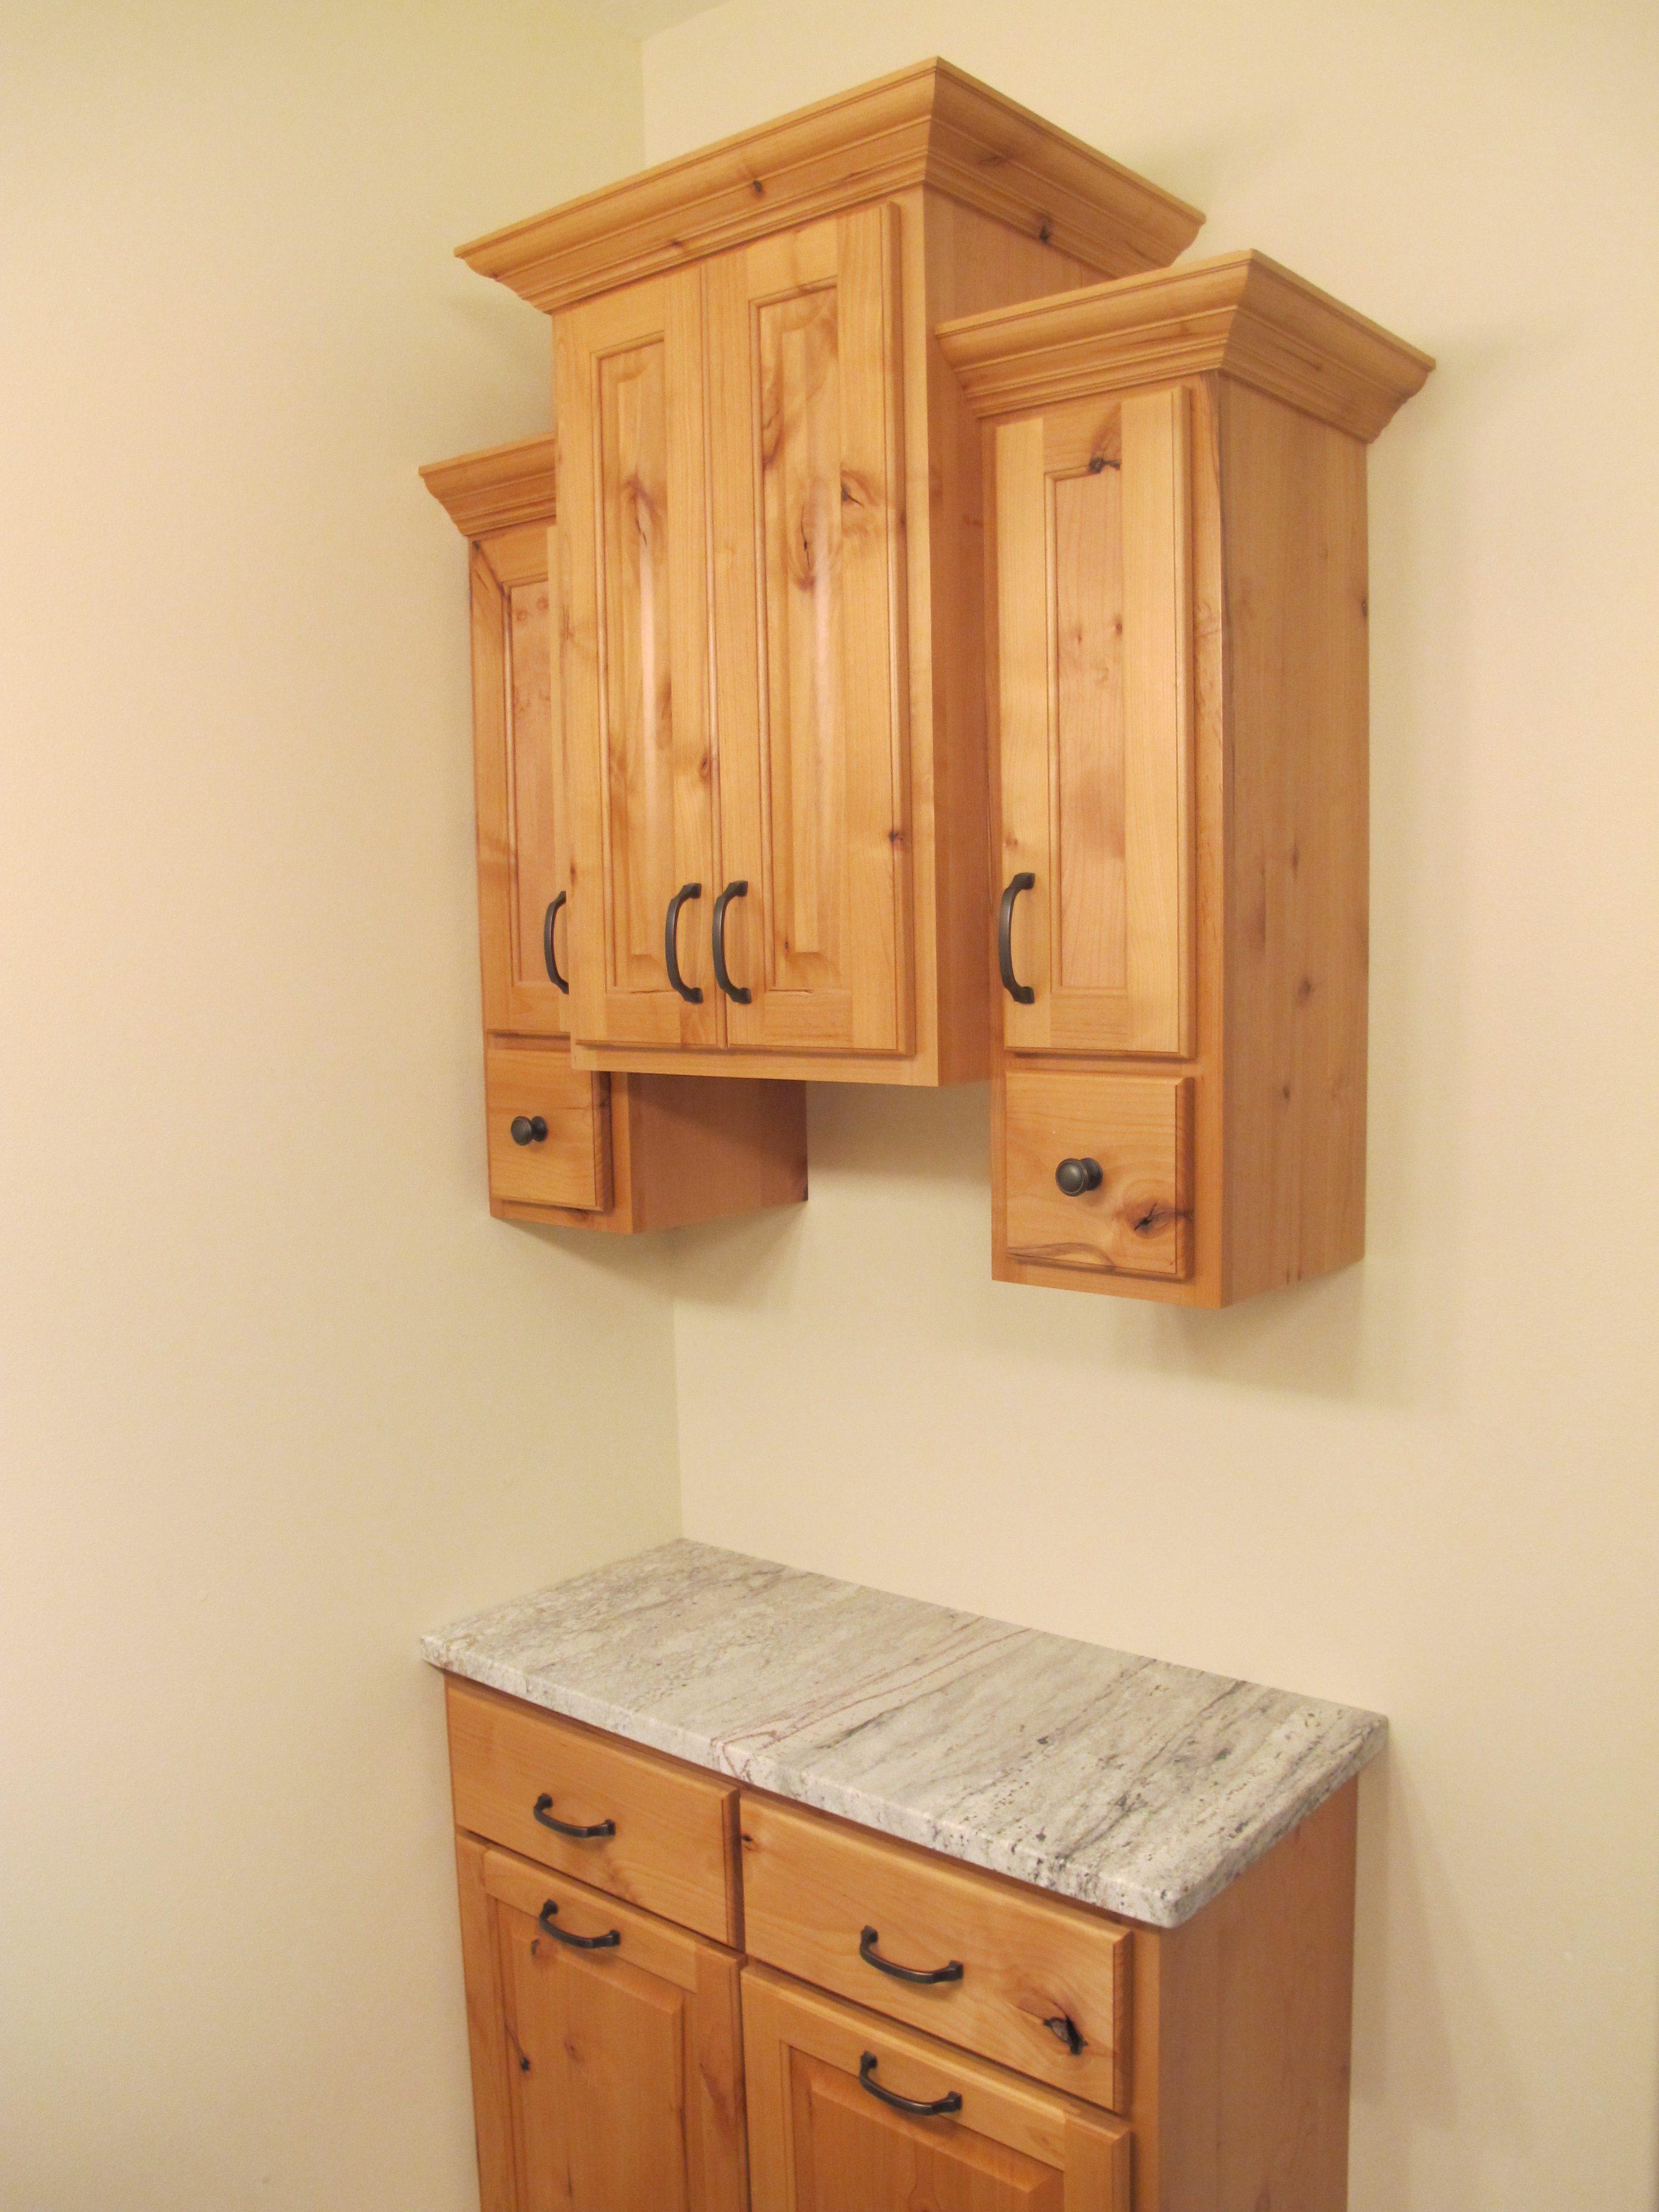 Rustic Alder Bathroom Cabinets Laundry